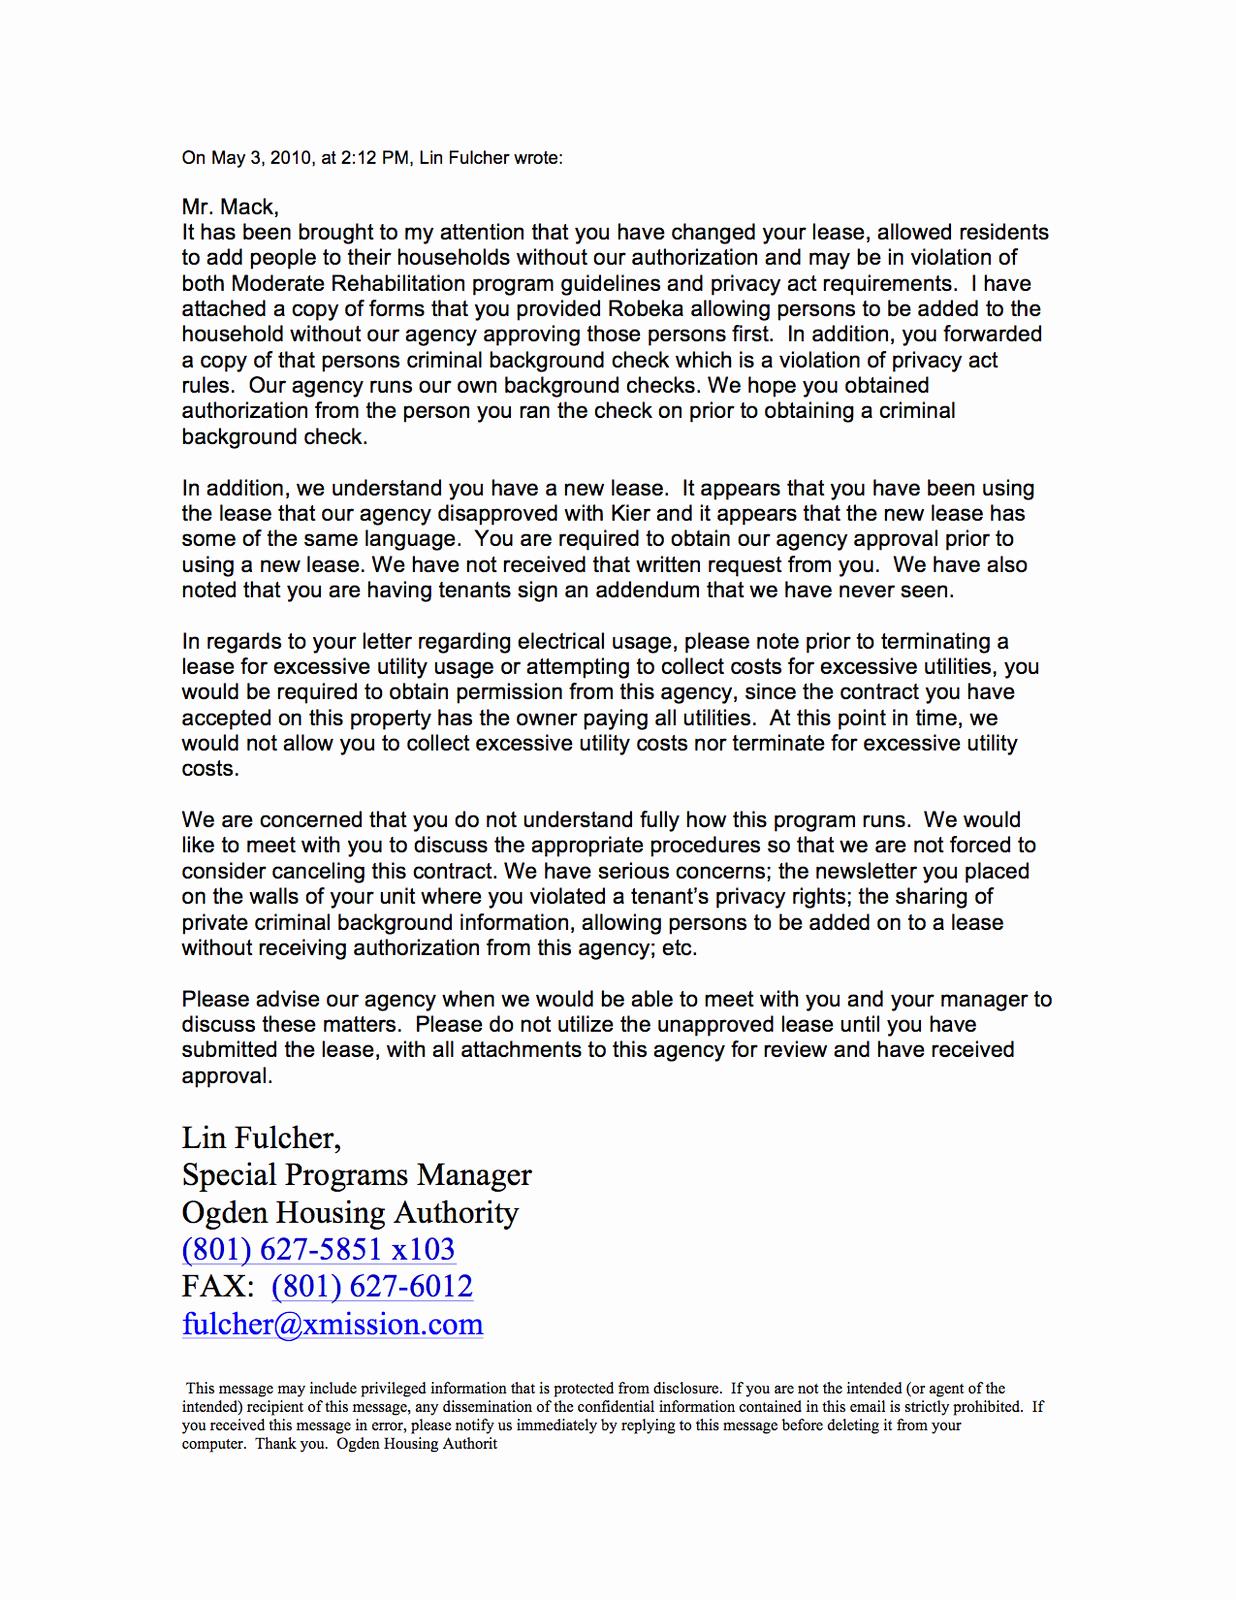 Unauthorized Tenant Letter Template Beautiful Kier Corp's Crap the Destruction Of A Landmark Oha Hud